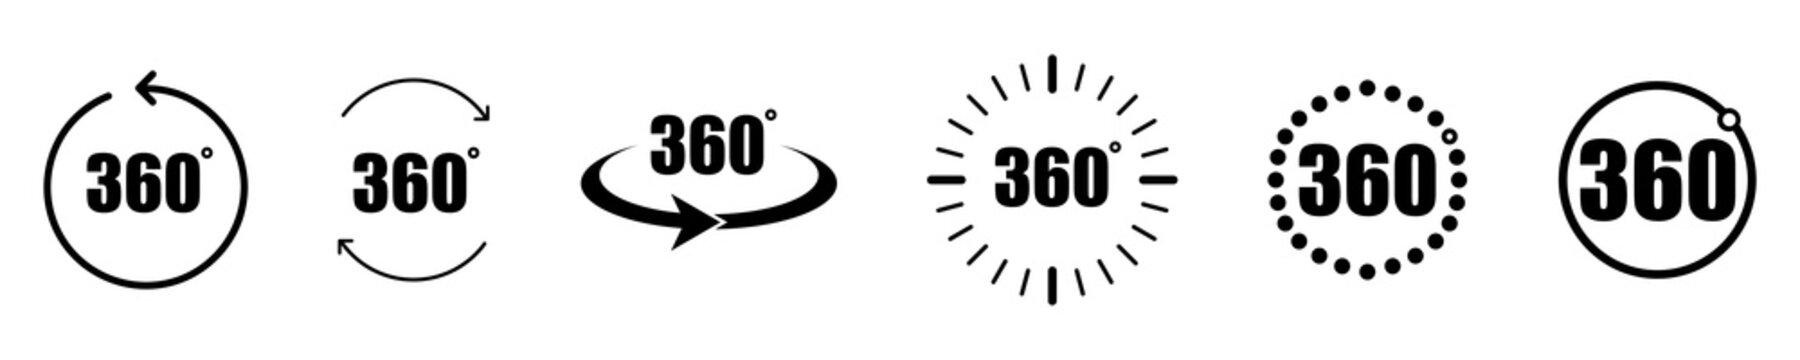 Different 360 degree icon set. 360 degree view icon set. Arrow icon. Symbol, logo illustration. Vector image. Vector graphic.